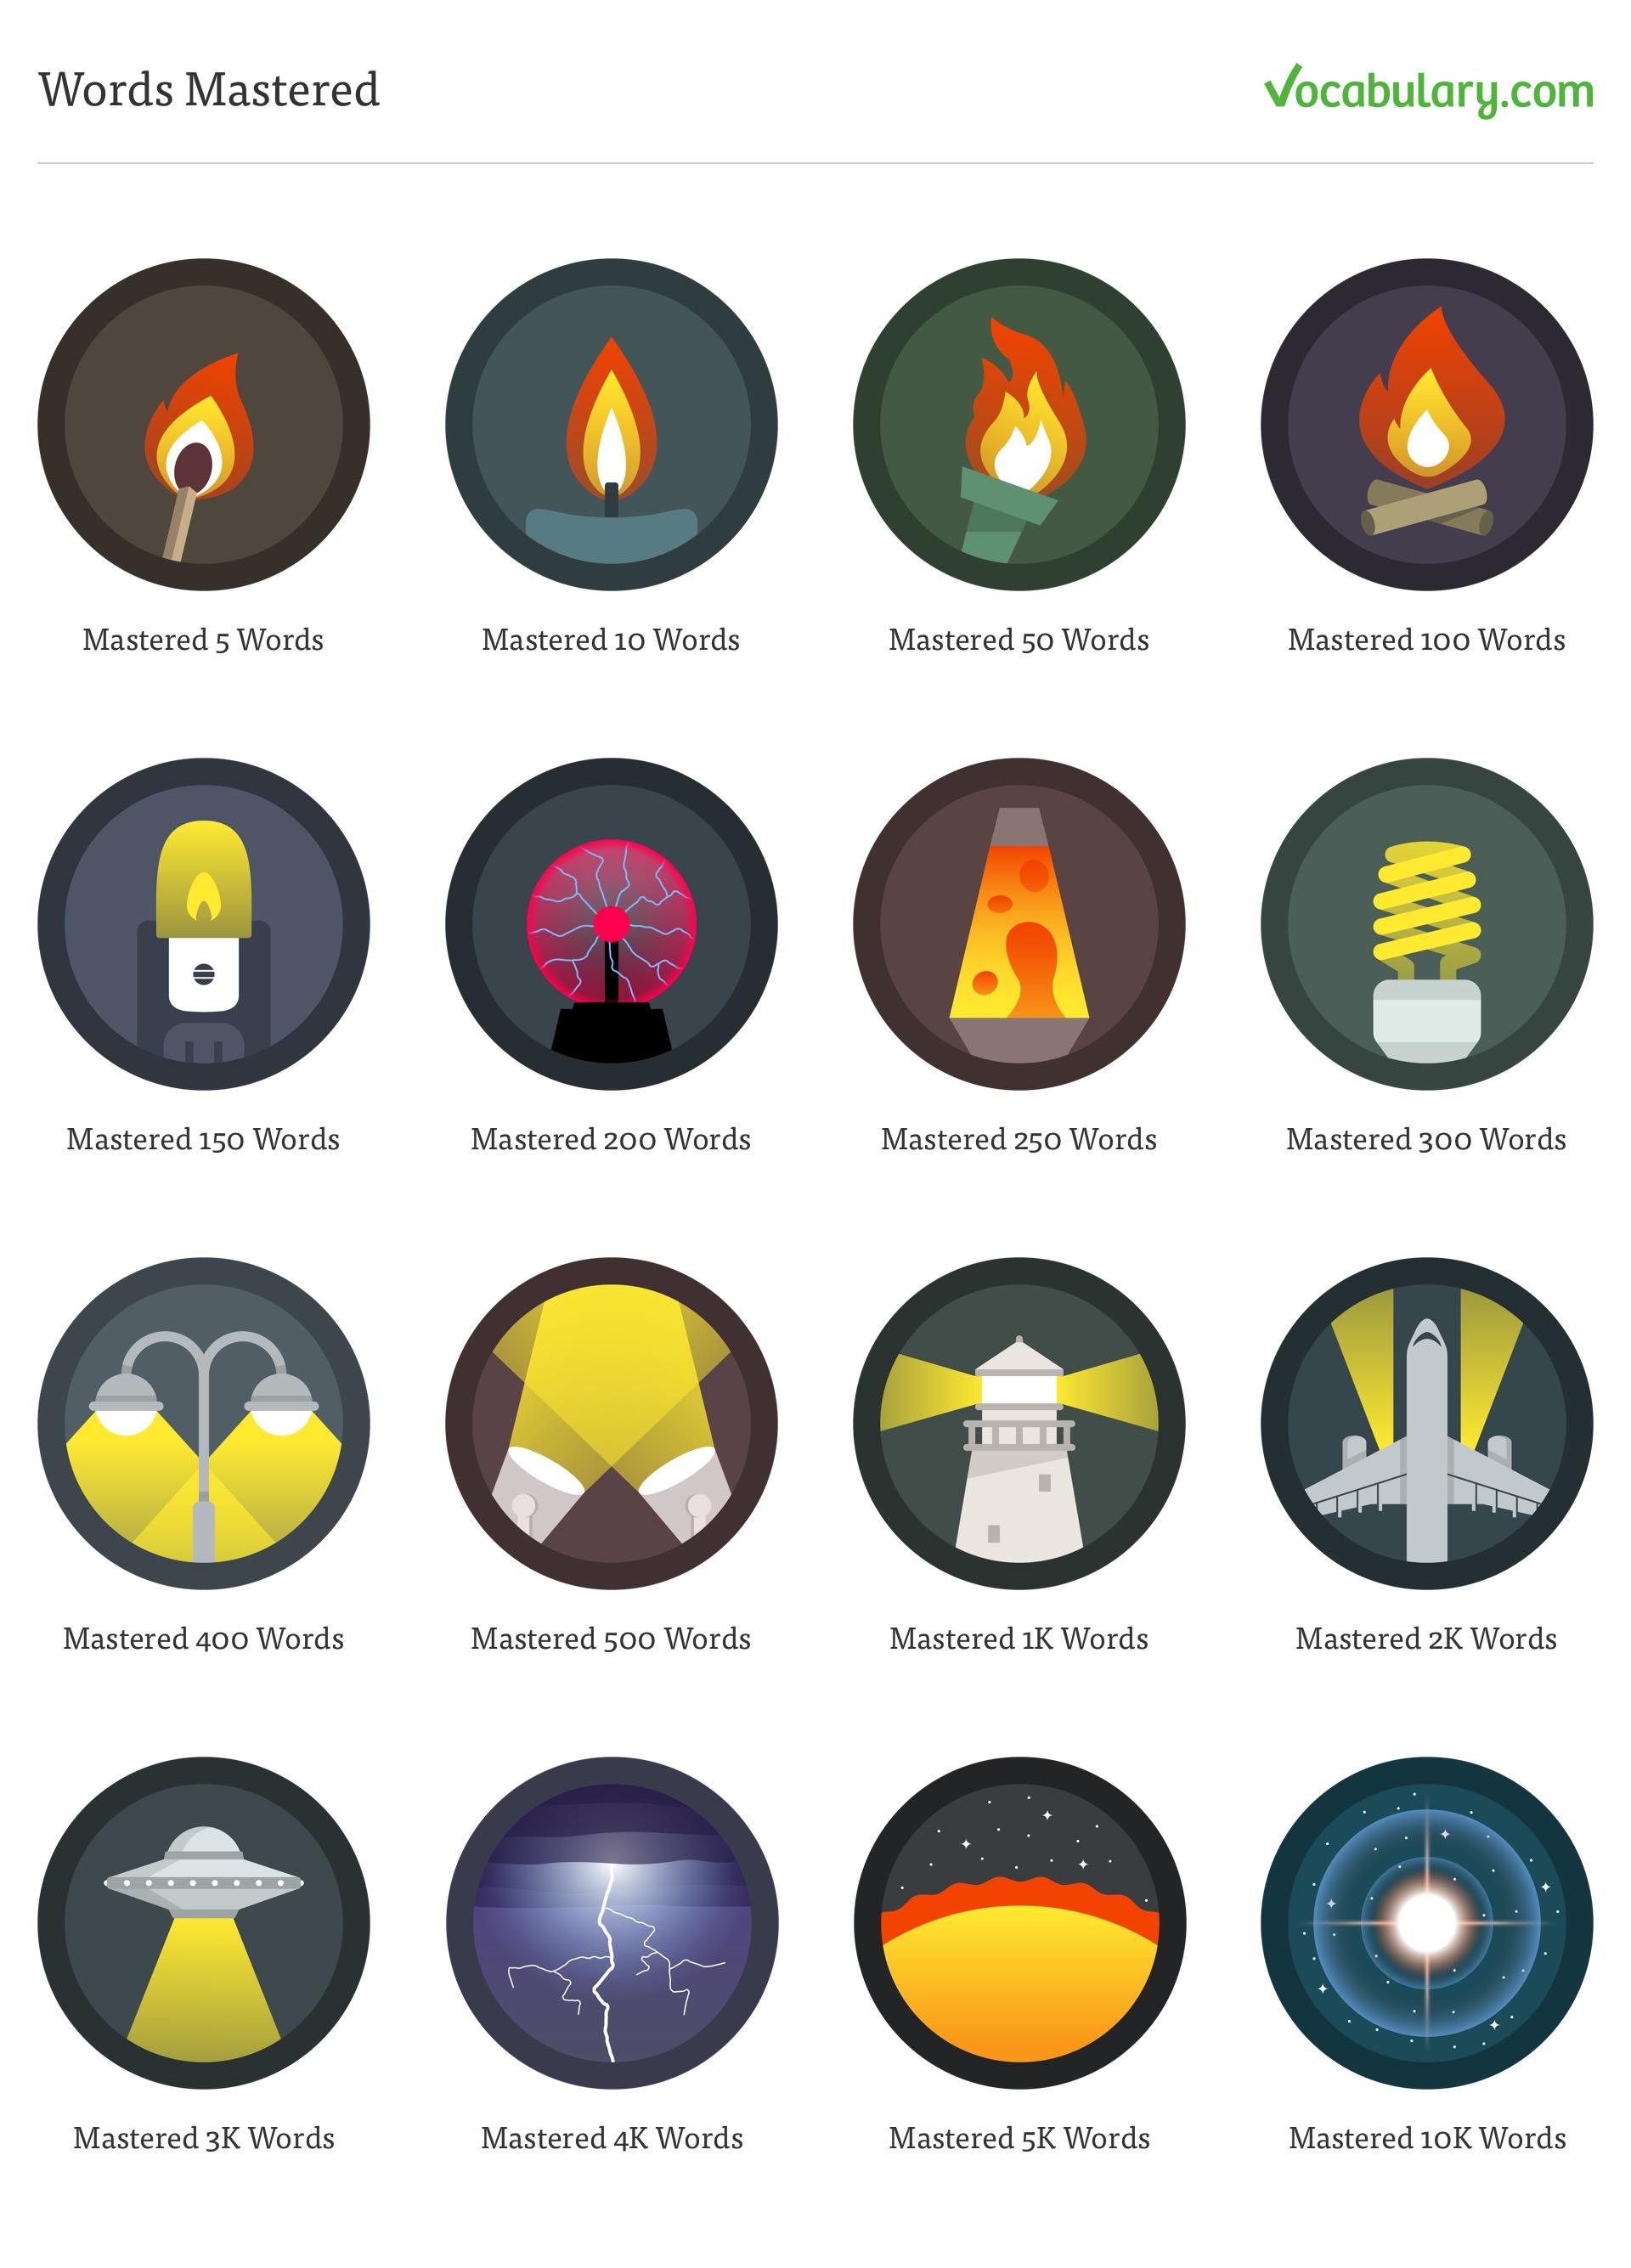 The final set of Words Mastered badges for Vocabulary.com